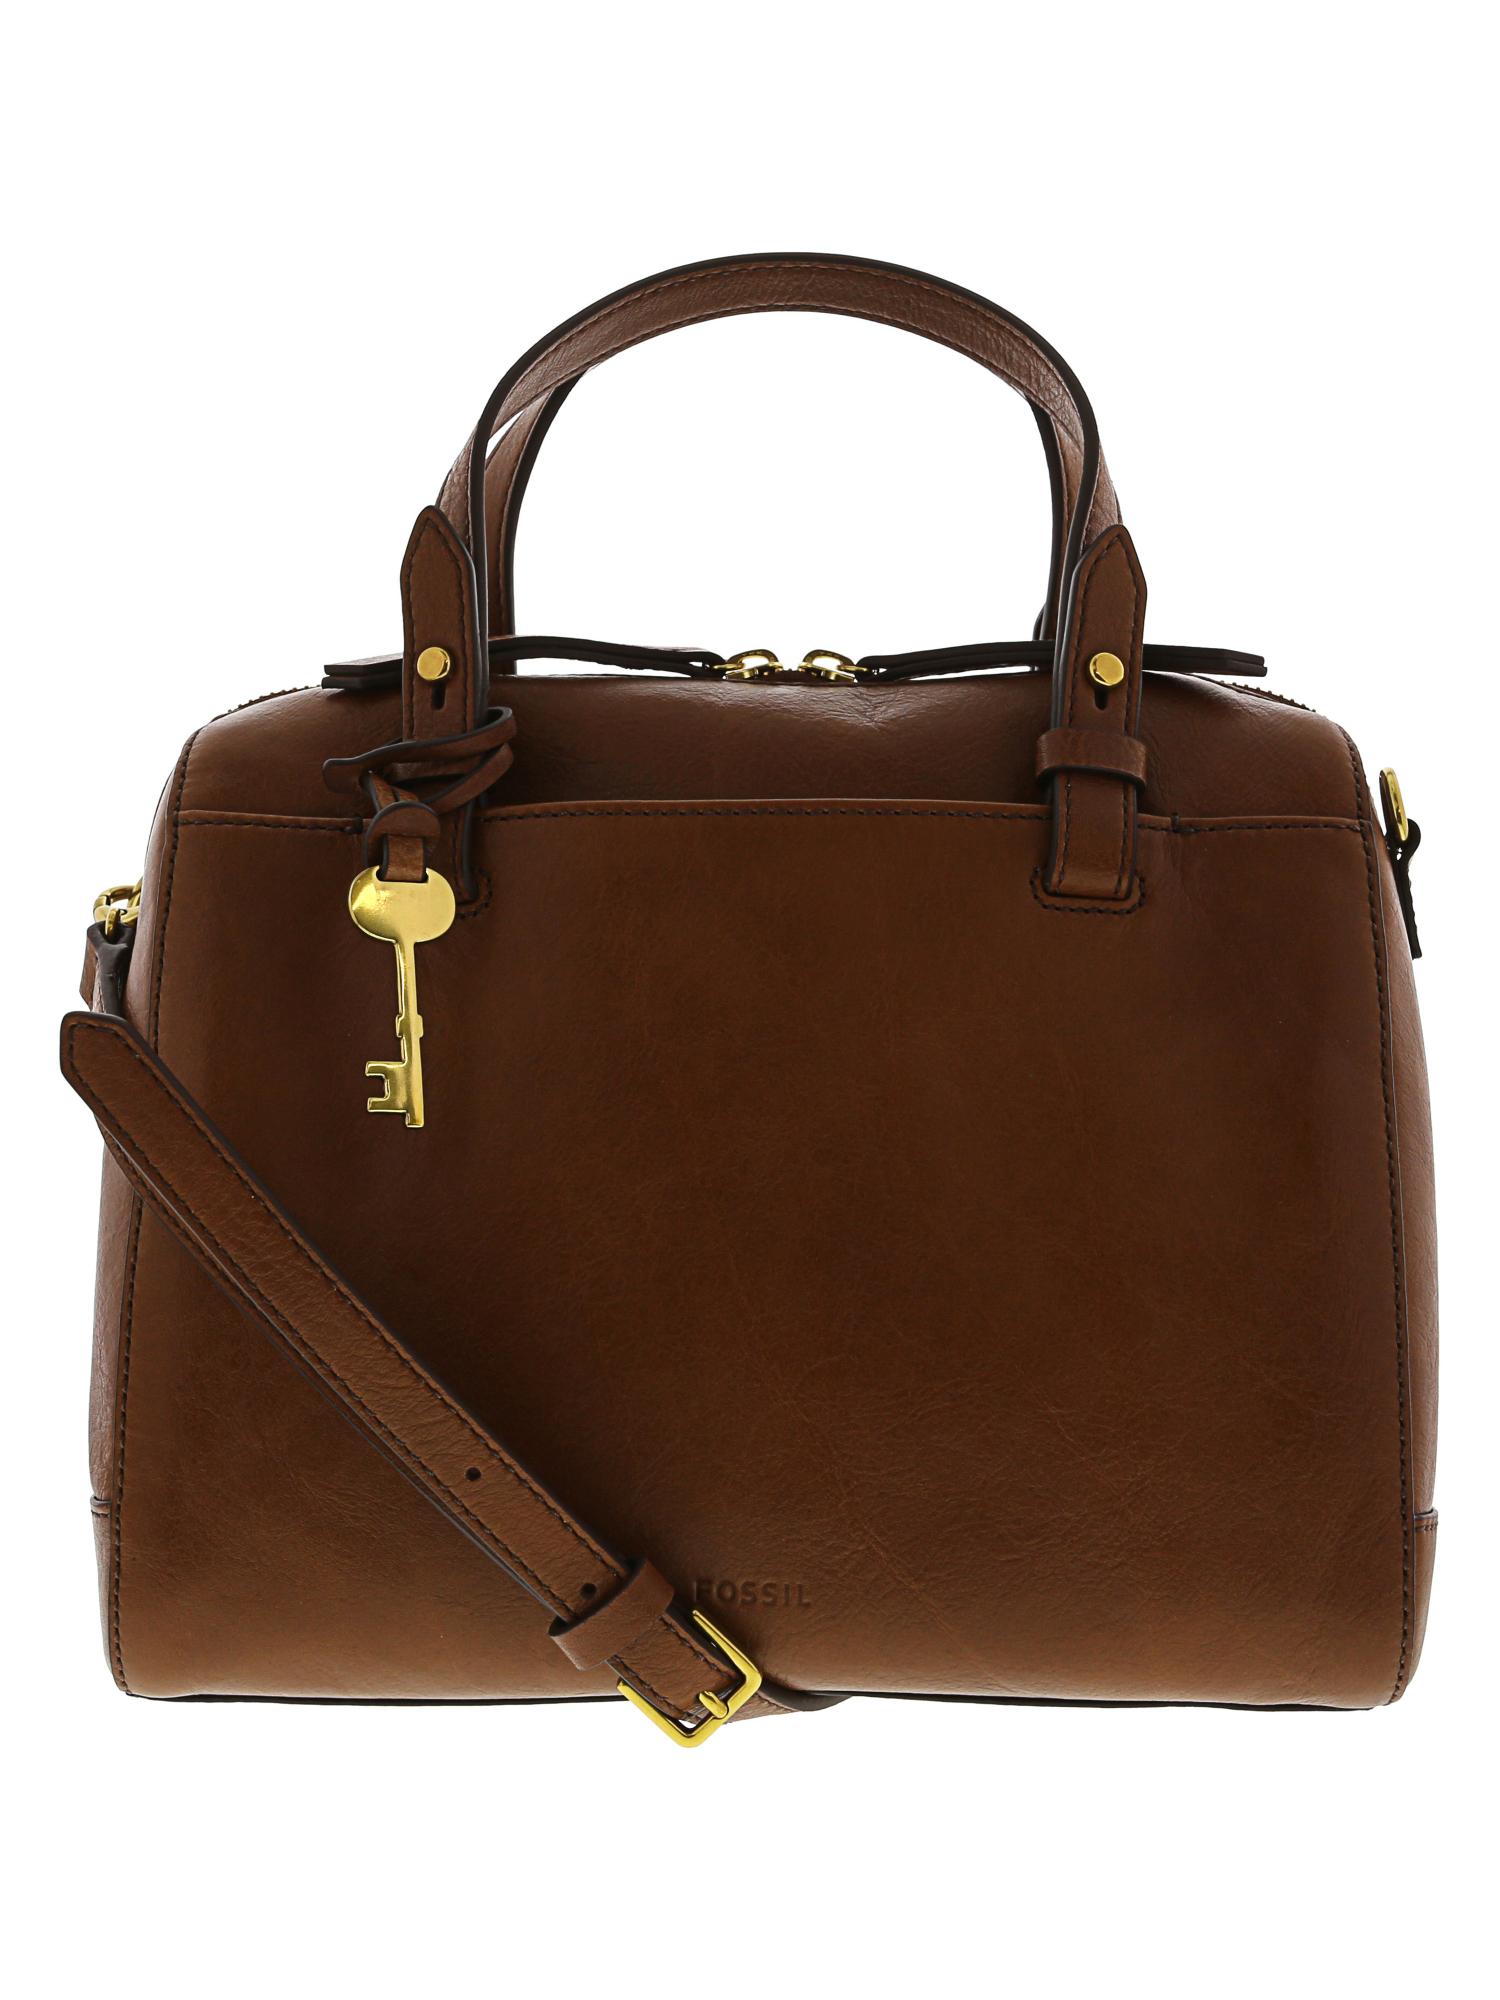 6b6730bbaa Fossil Women s Rachel Satchel Handbag Leather Shoulder Bag